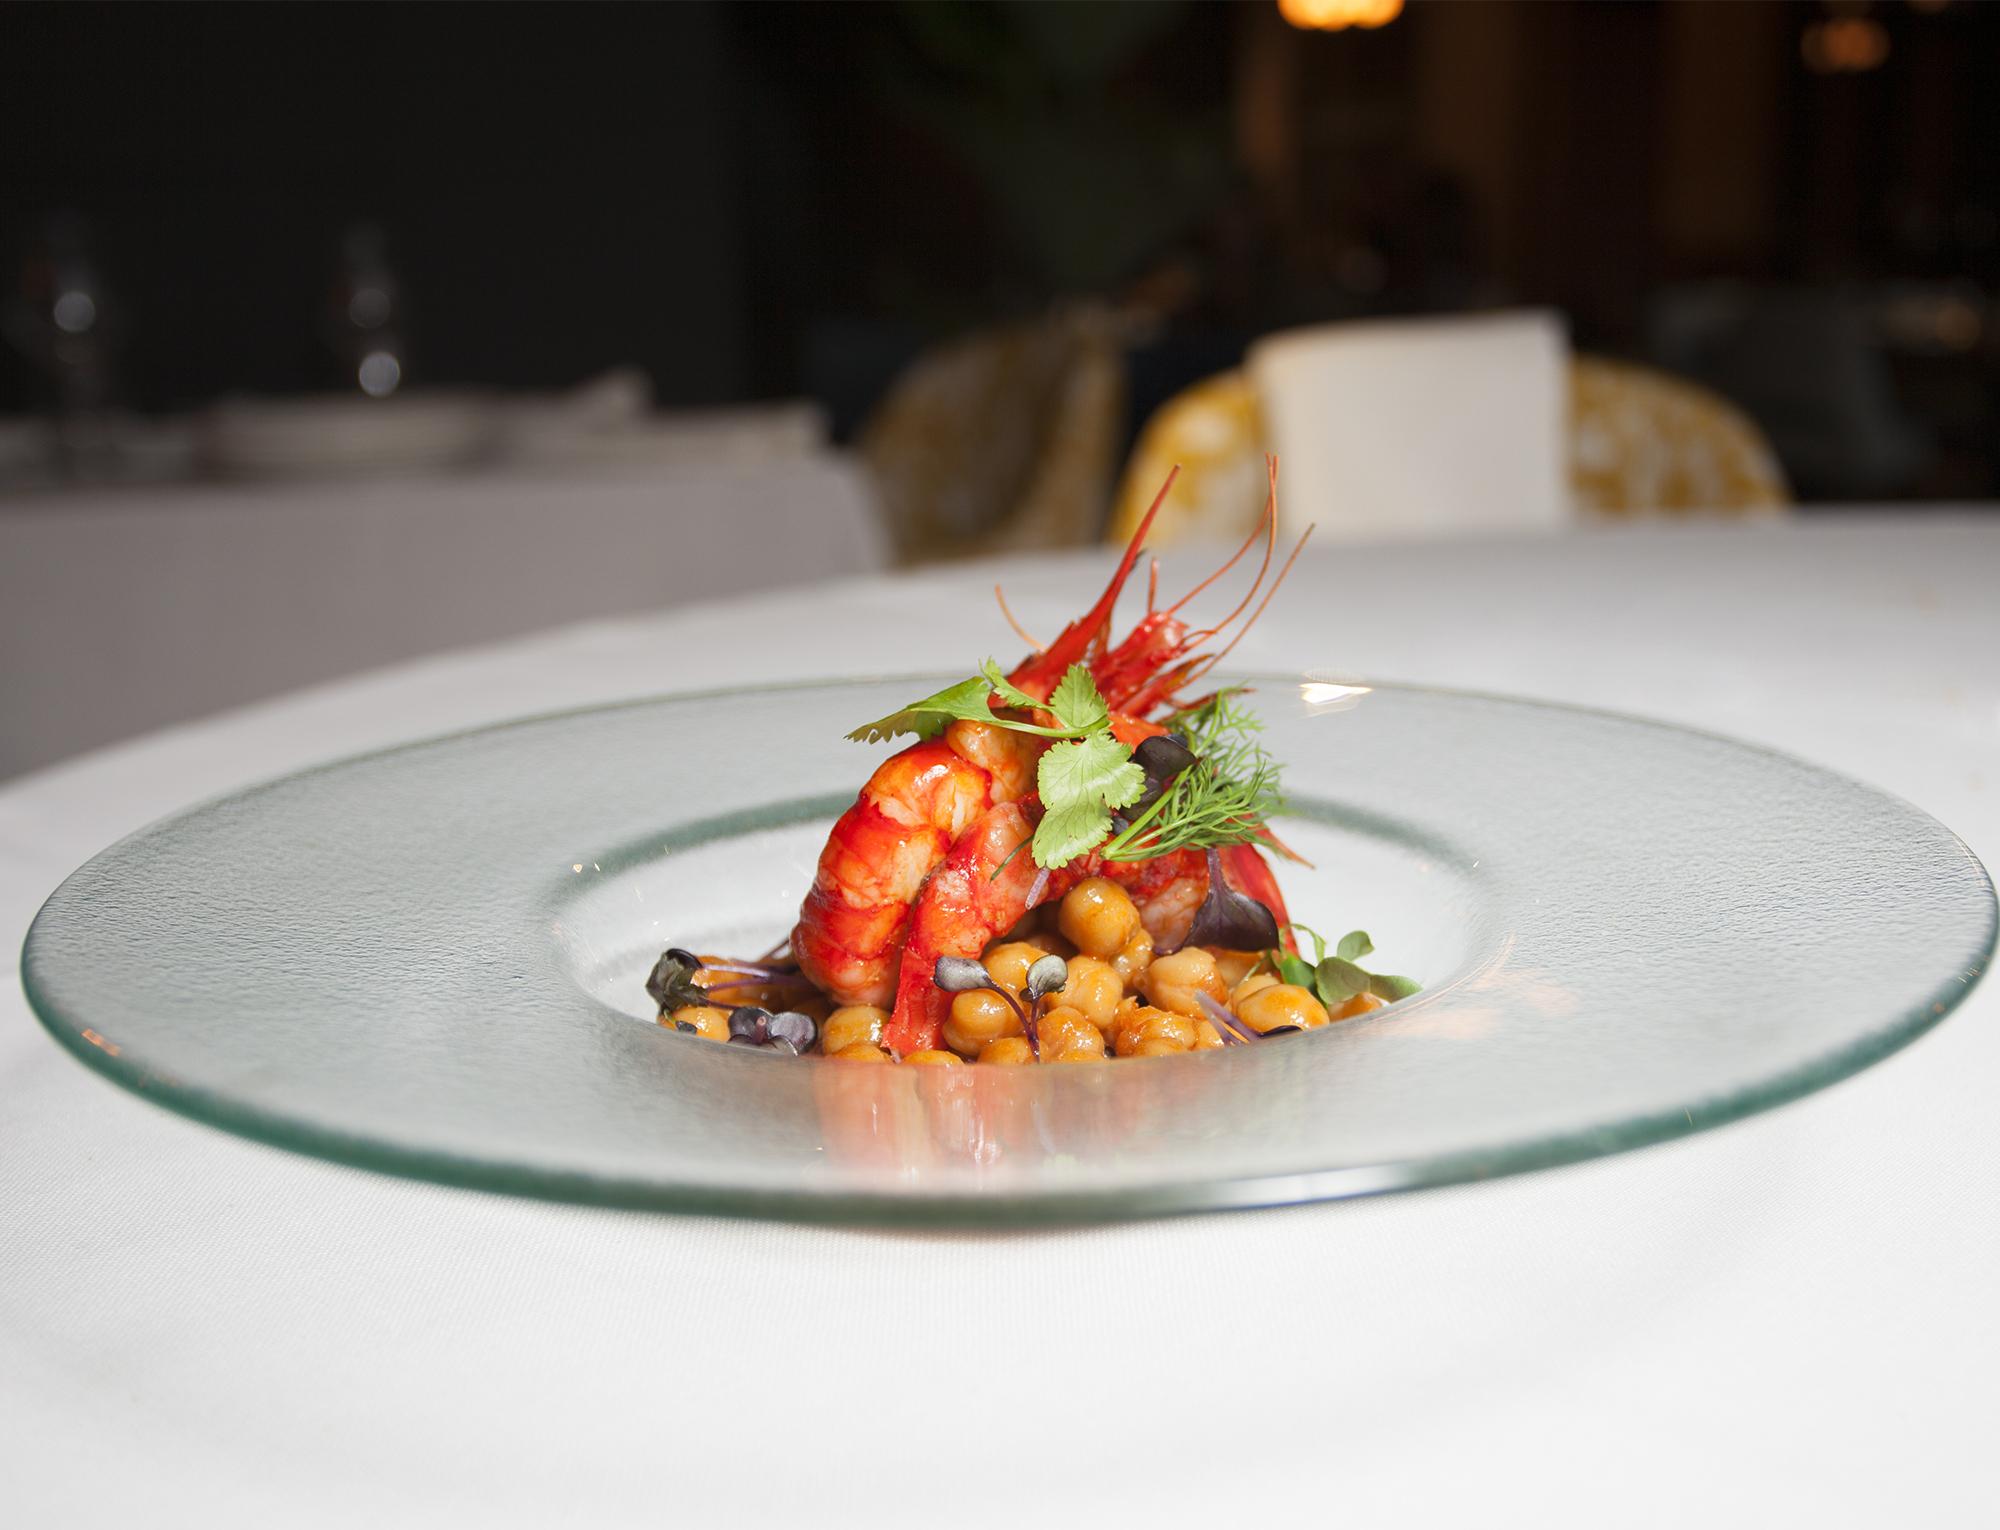 Receta garbanzos con carabineros restaurante Casino Alcalá